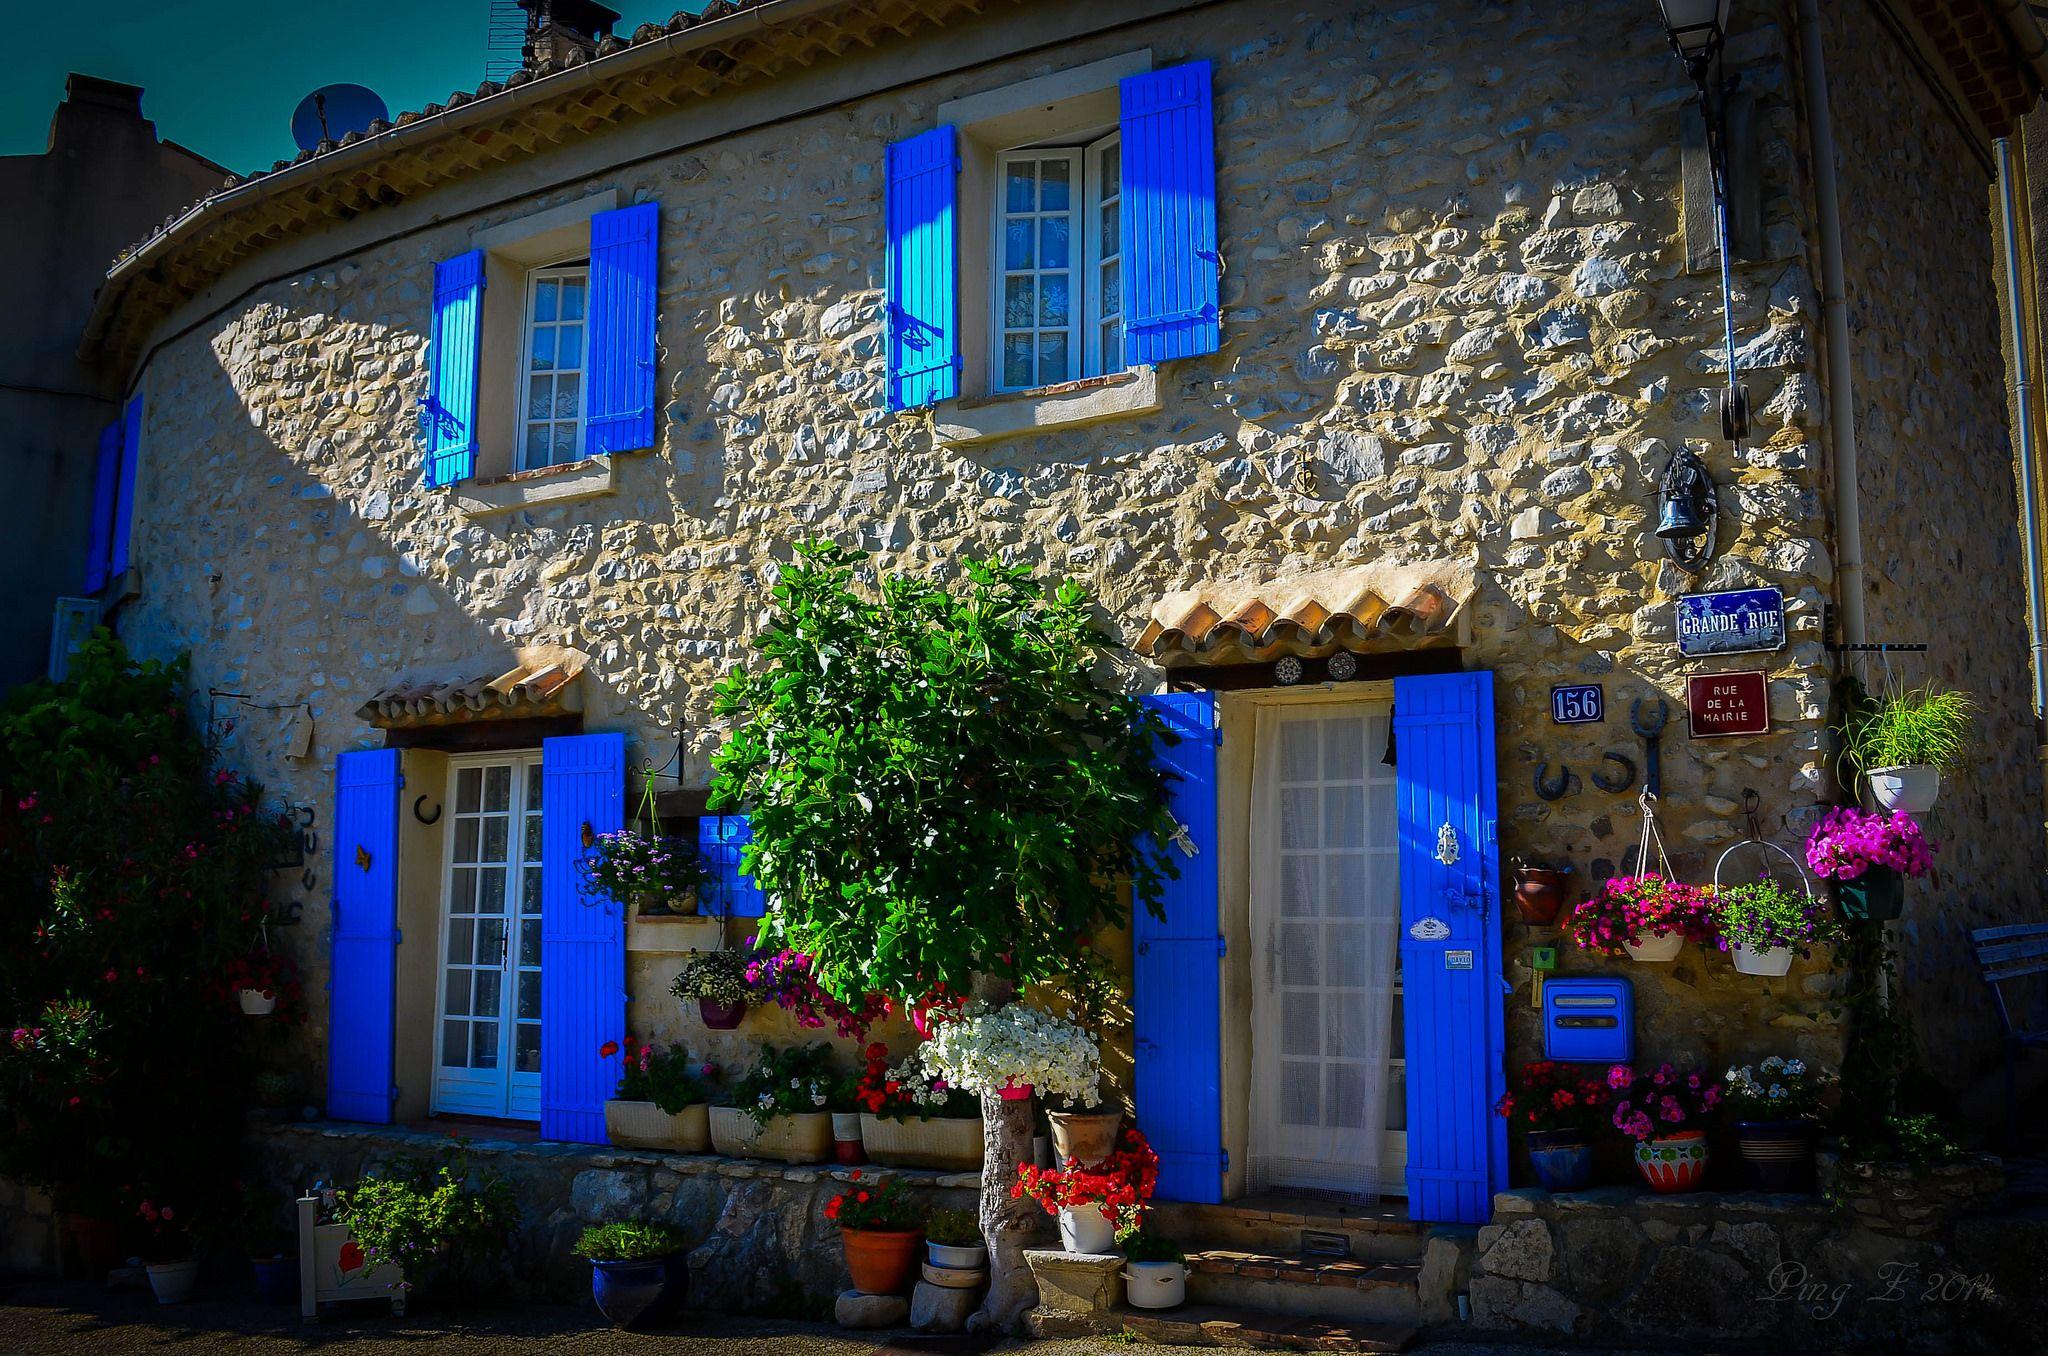 https://flic.kr/p/r3oNx3   2-ProvenceDSC_0260-1   Provence